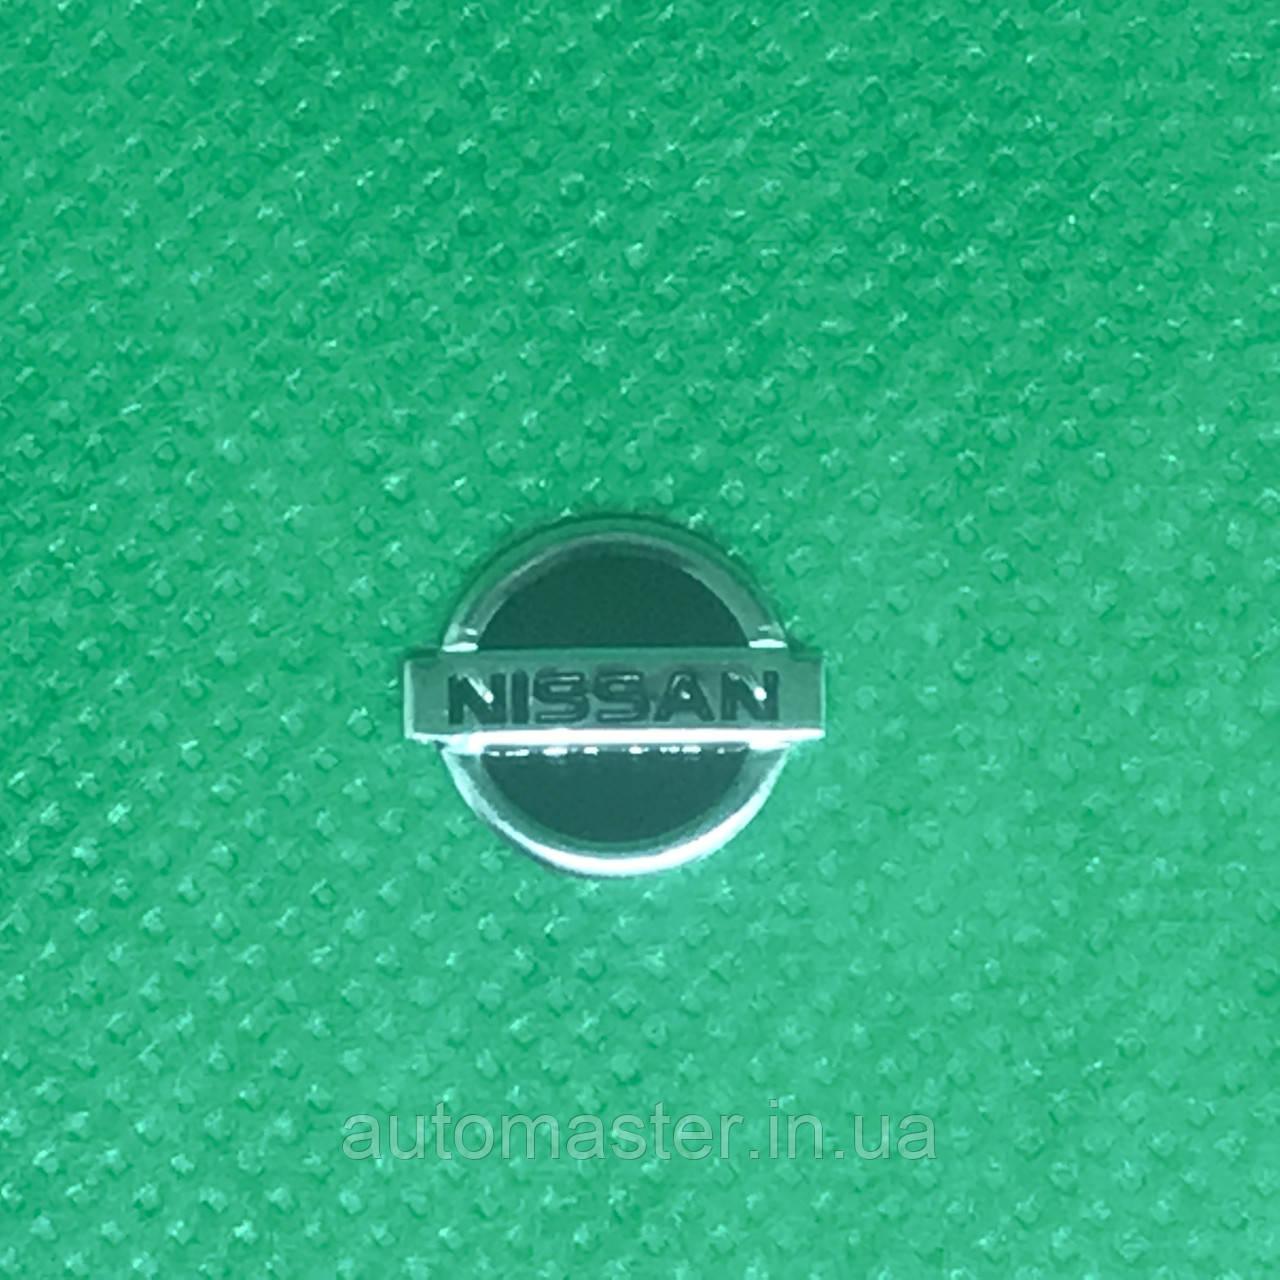 Логотип для авто ключа Ниссан Nissan